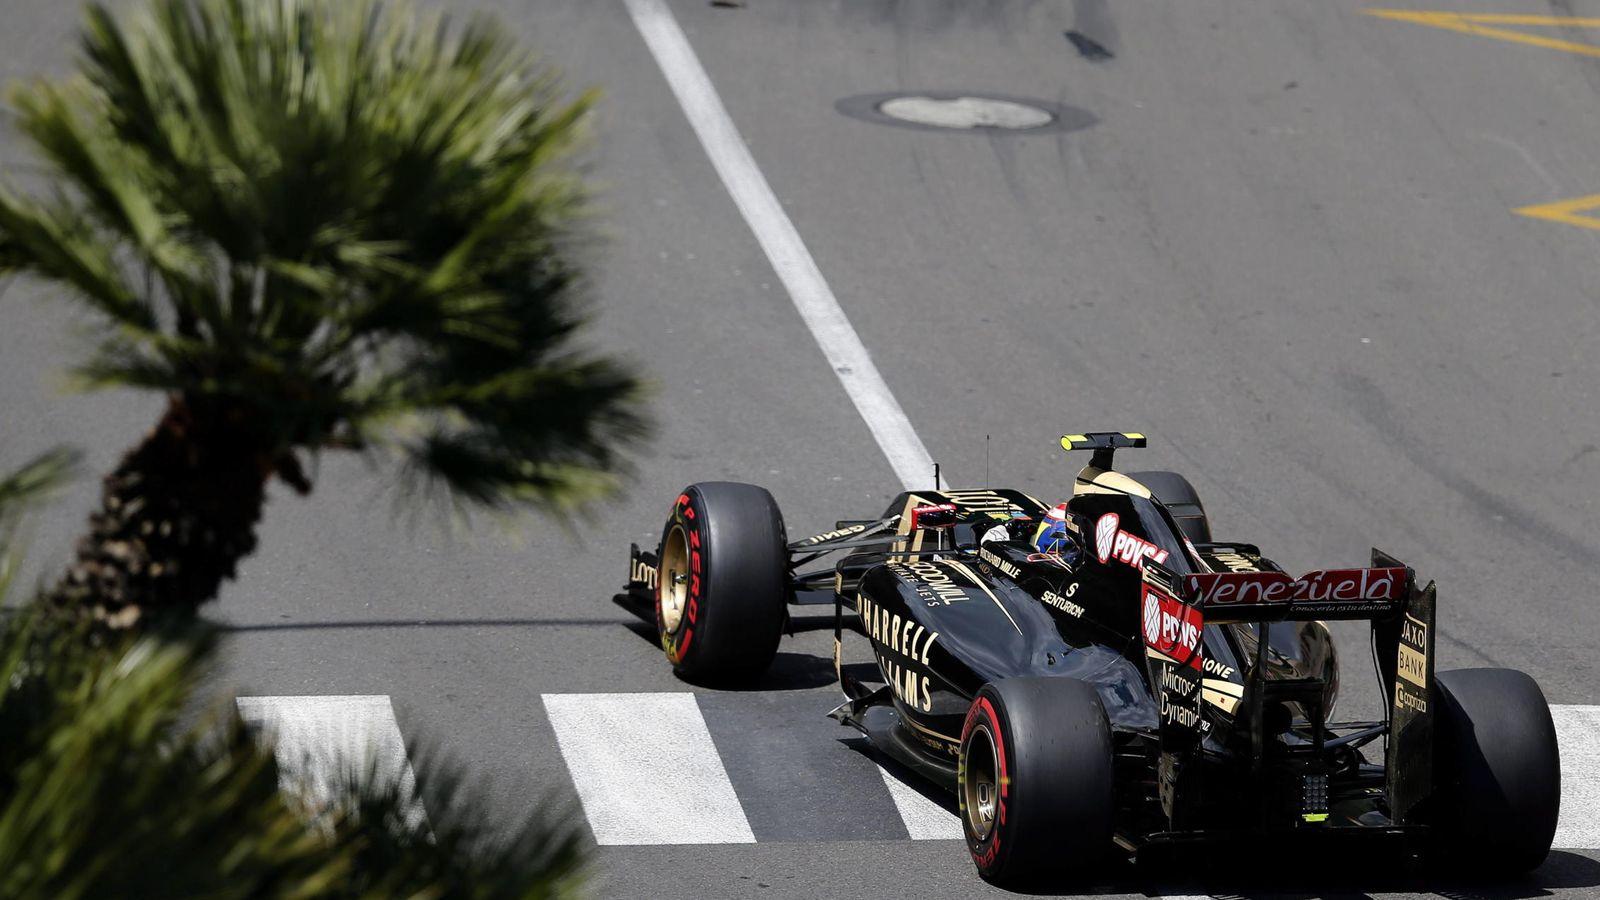 Foto: Lotus en Mónaco (Efe).